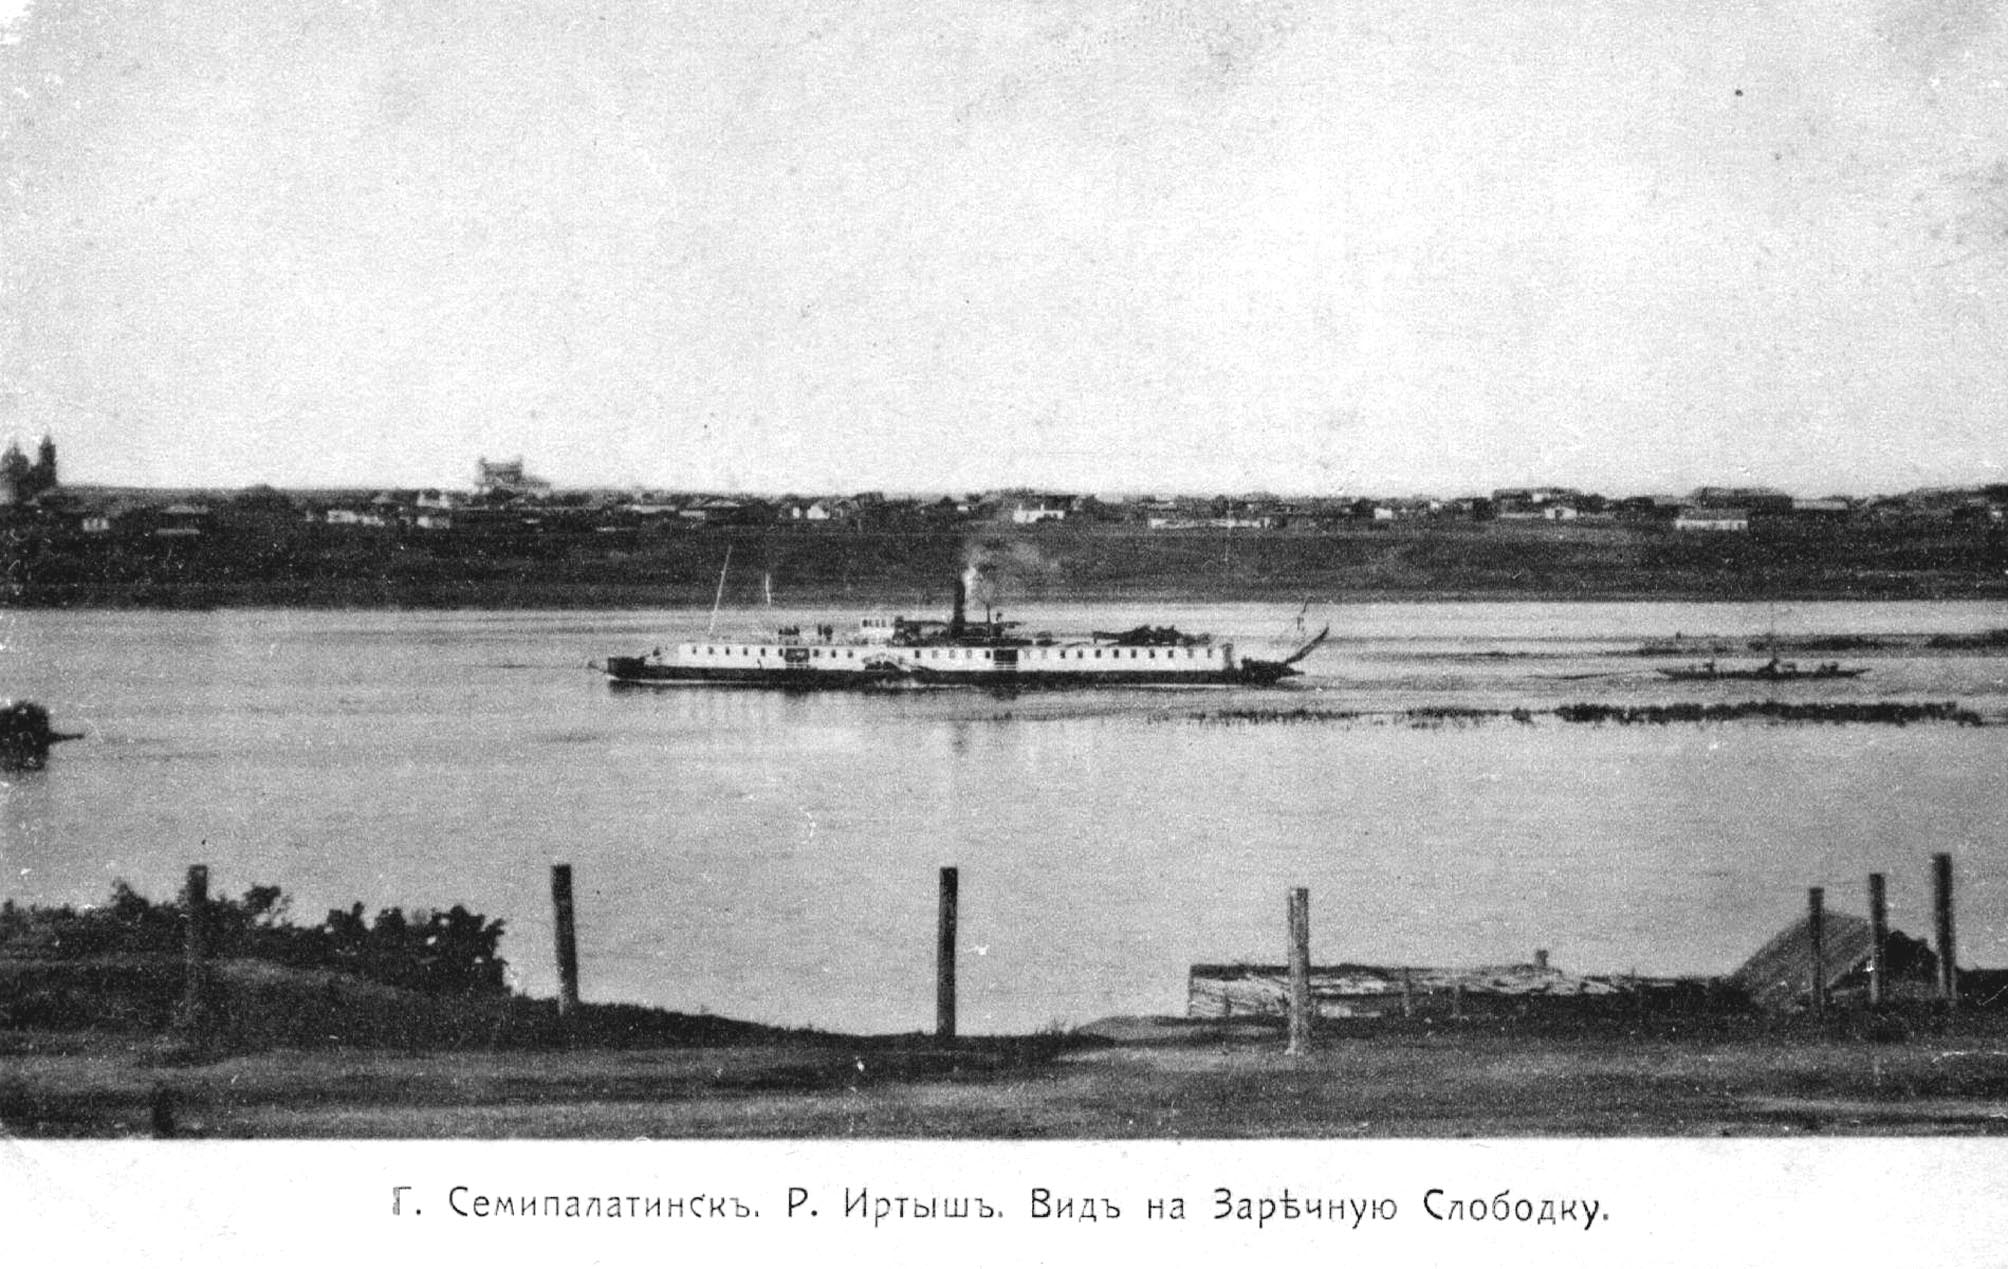 Река Иртыш. Вид на Заречную слободку